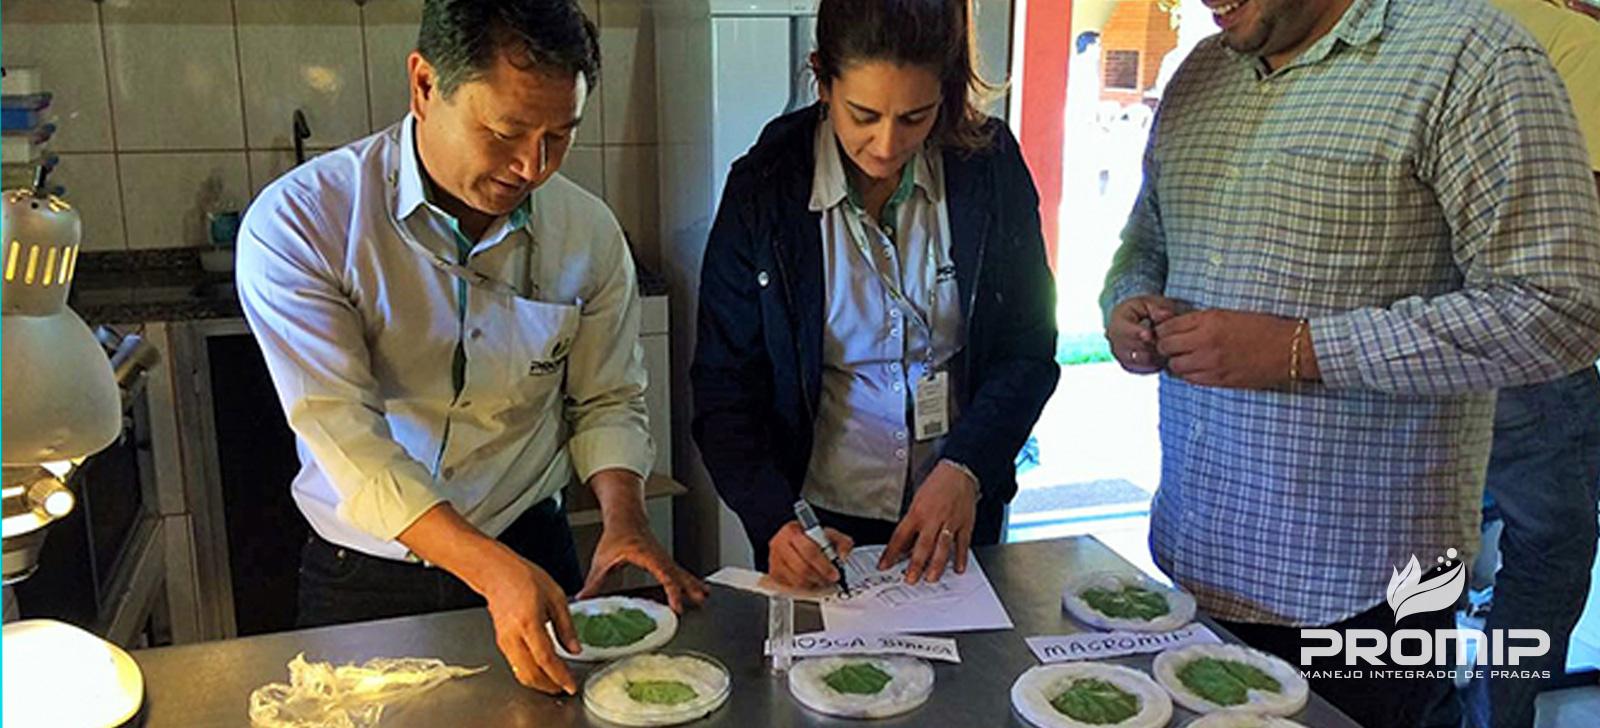 promip manejo integrado de pragas controle biologico tranferencia conhcimento promip